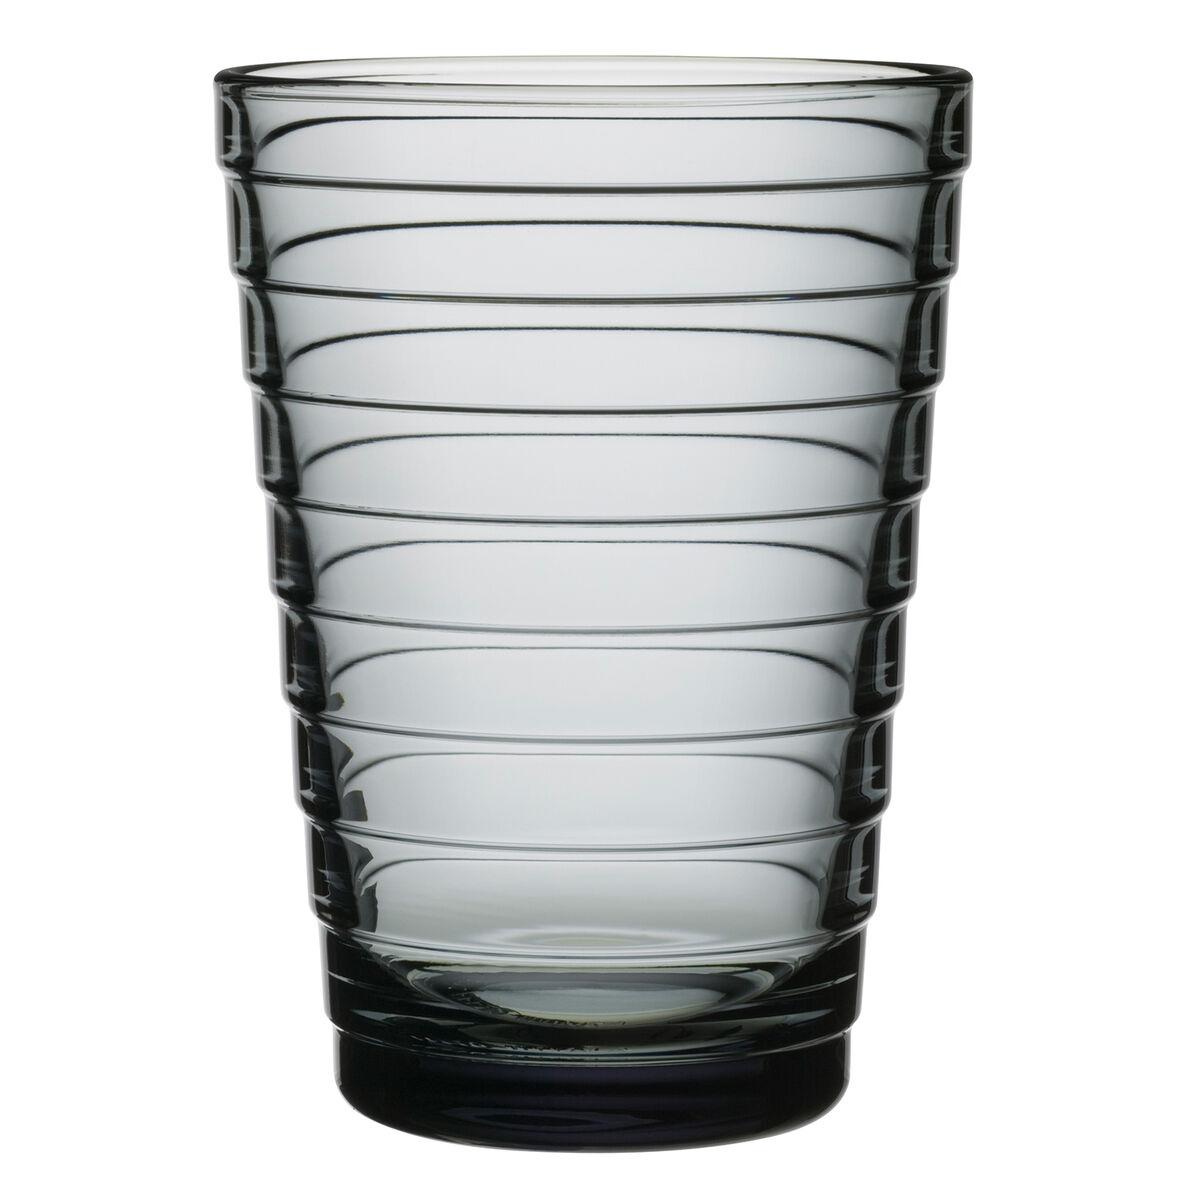 iittala Aino Aalto juomalasi 33 cl, harmaa, 2 kpl